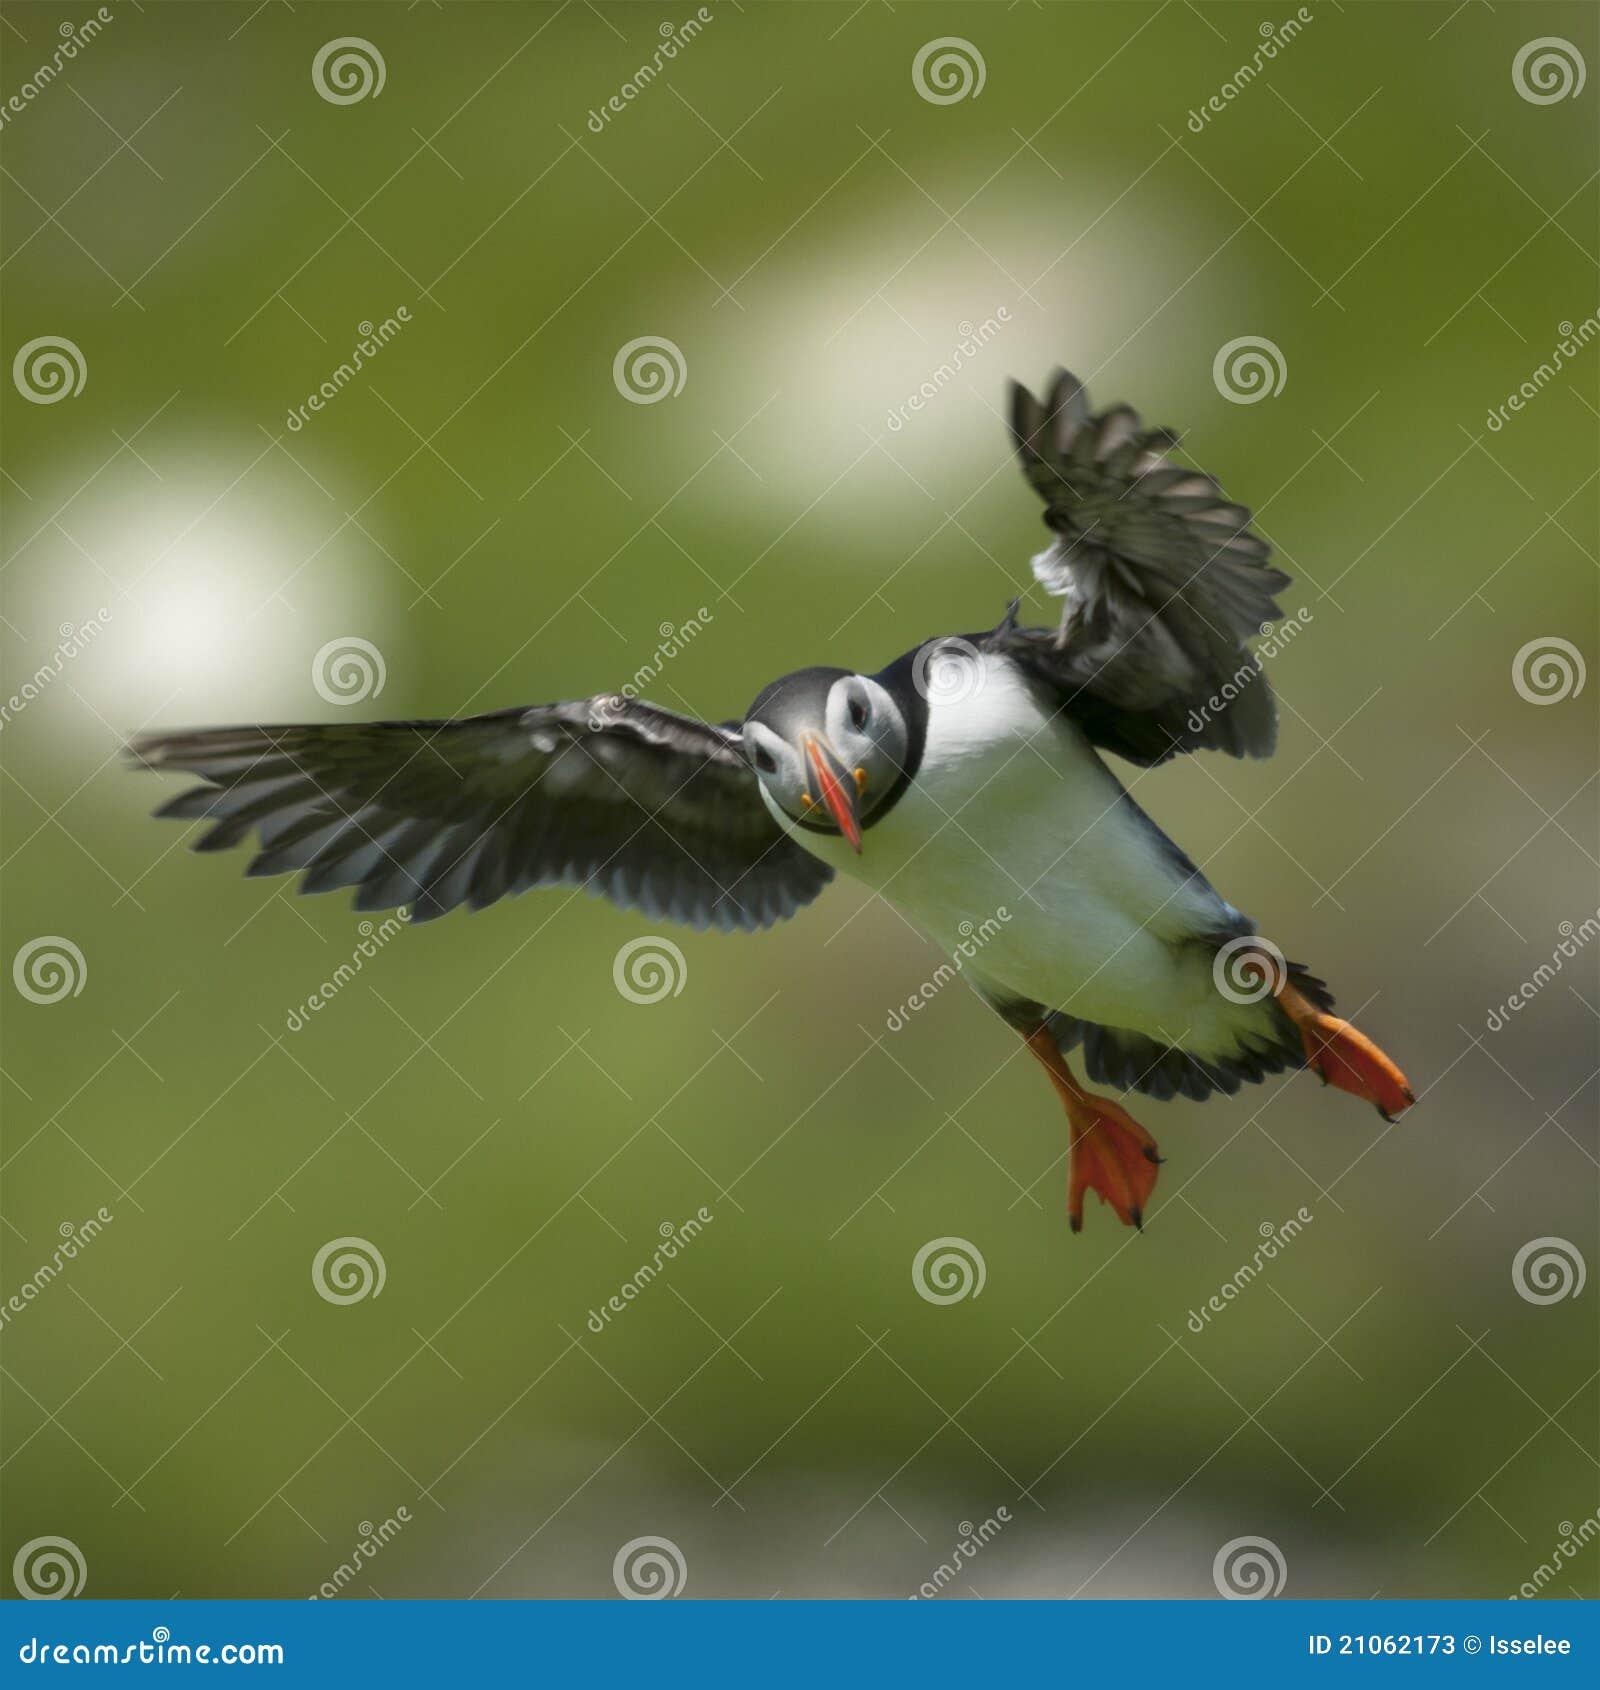 Papagaio-do-mar atlântico ou papagaio-do-mar comum